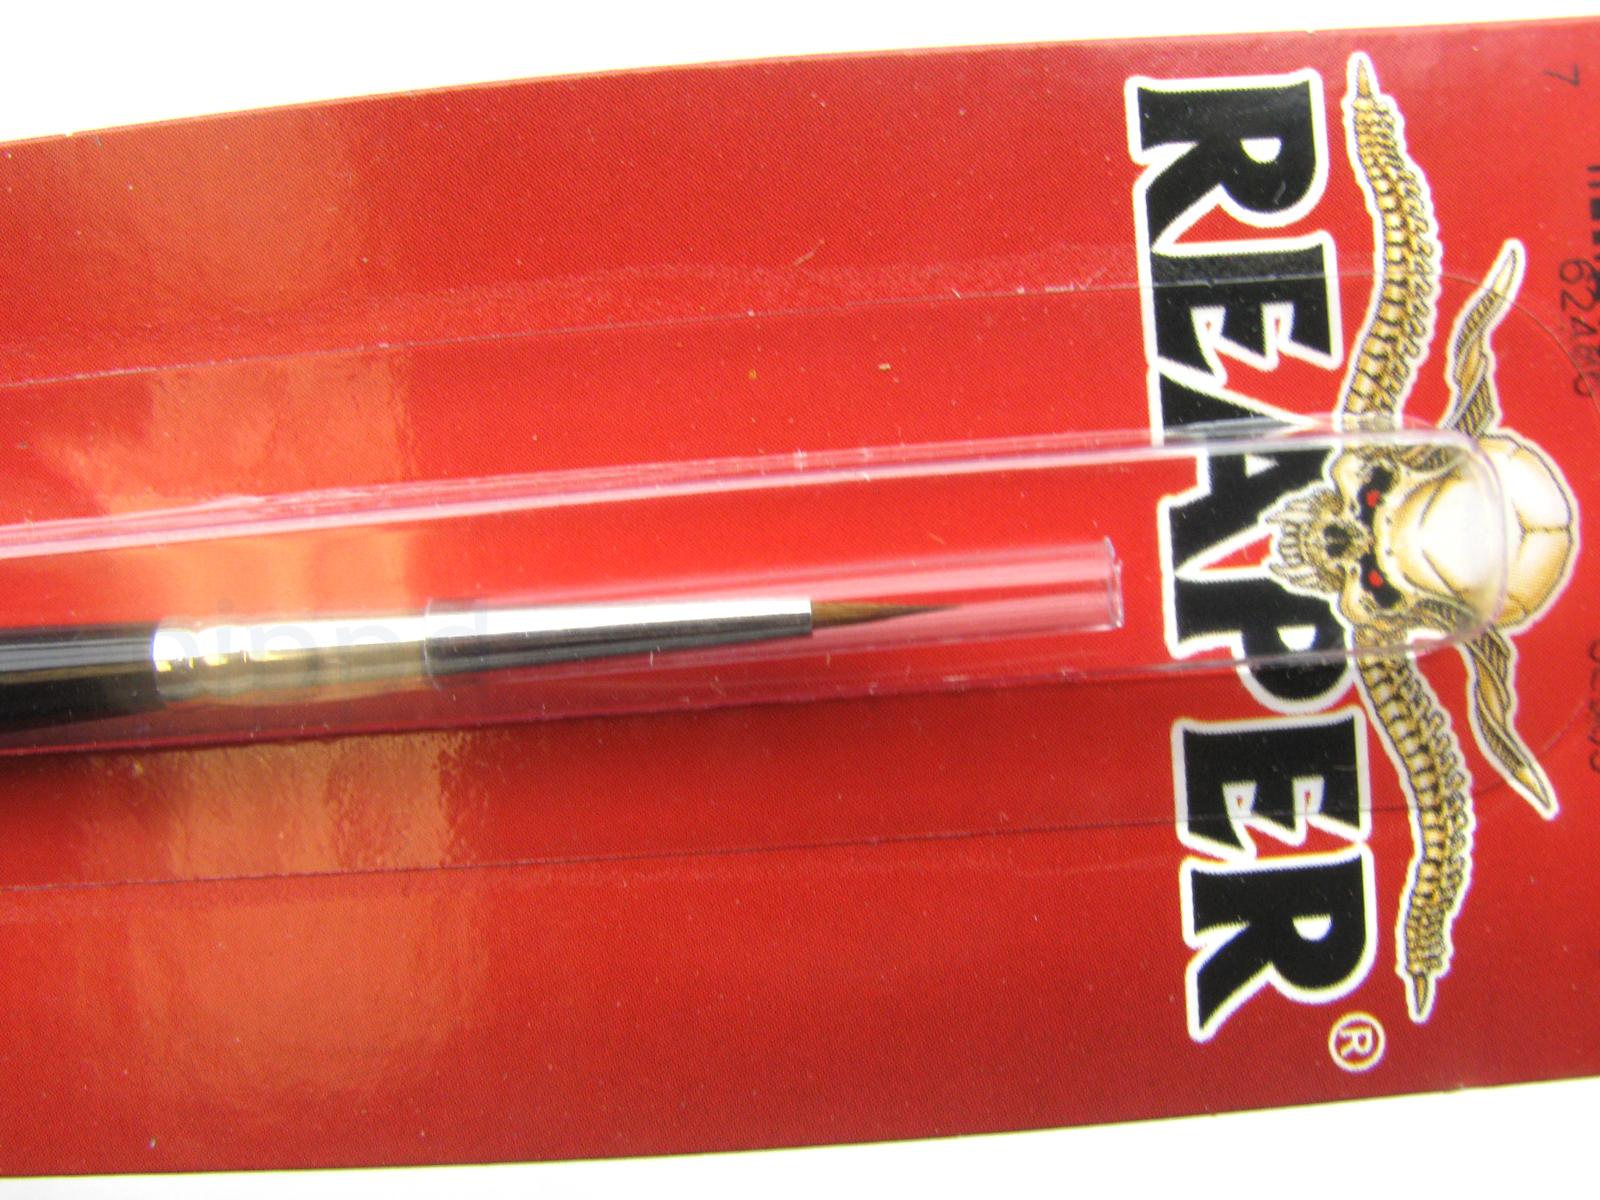 No 10/0 Round Paint Brush Kolinsky Sable Master Series Reaper Minatures